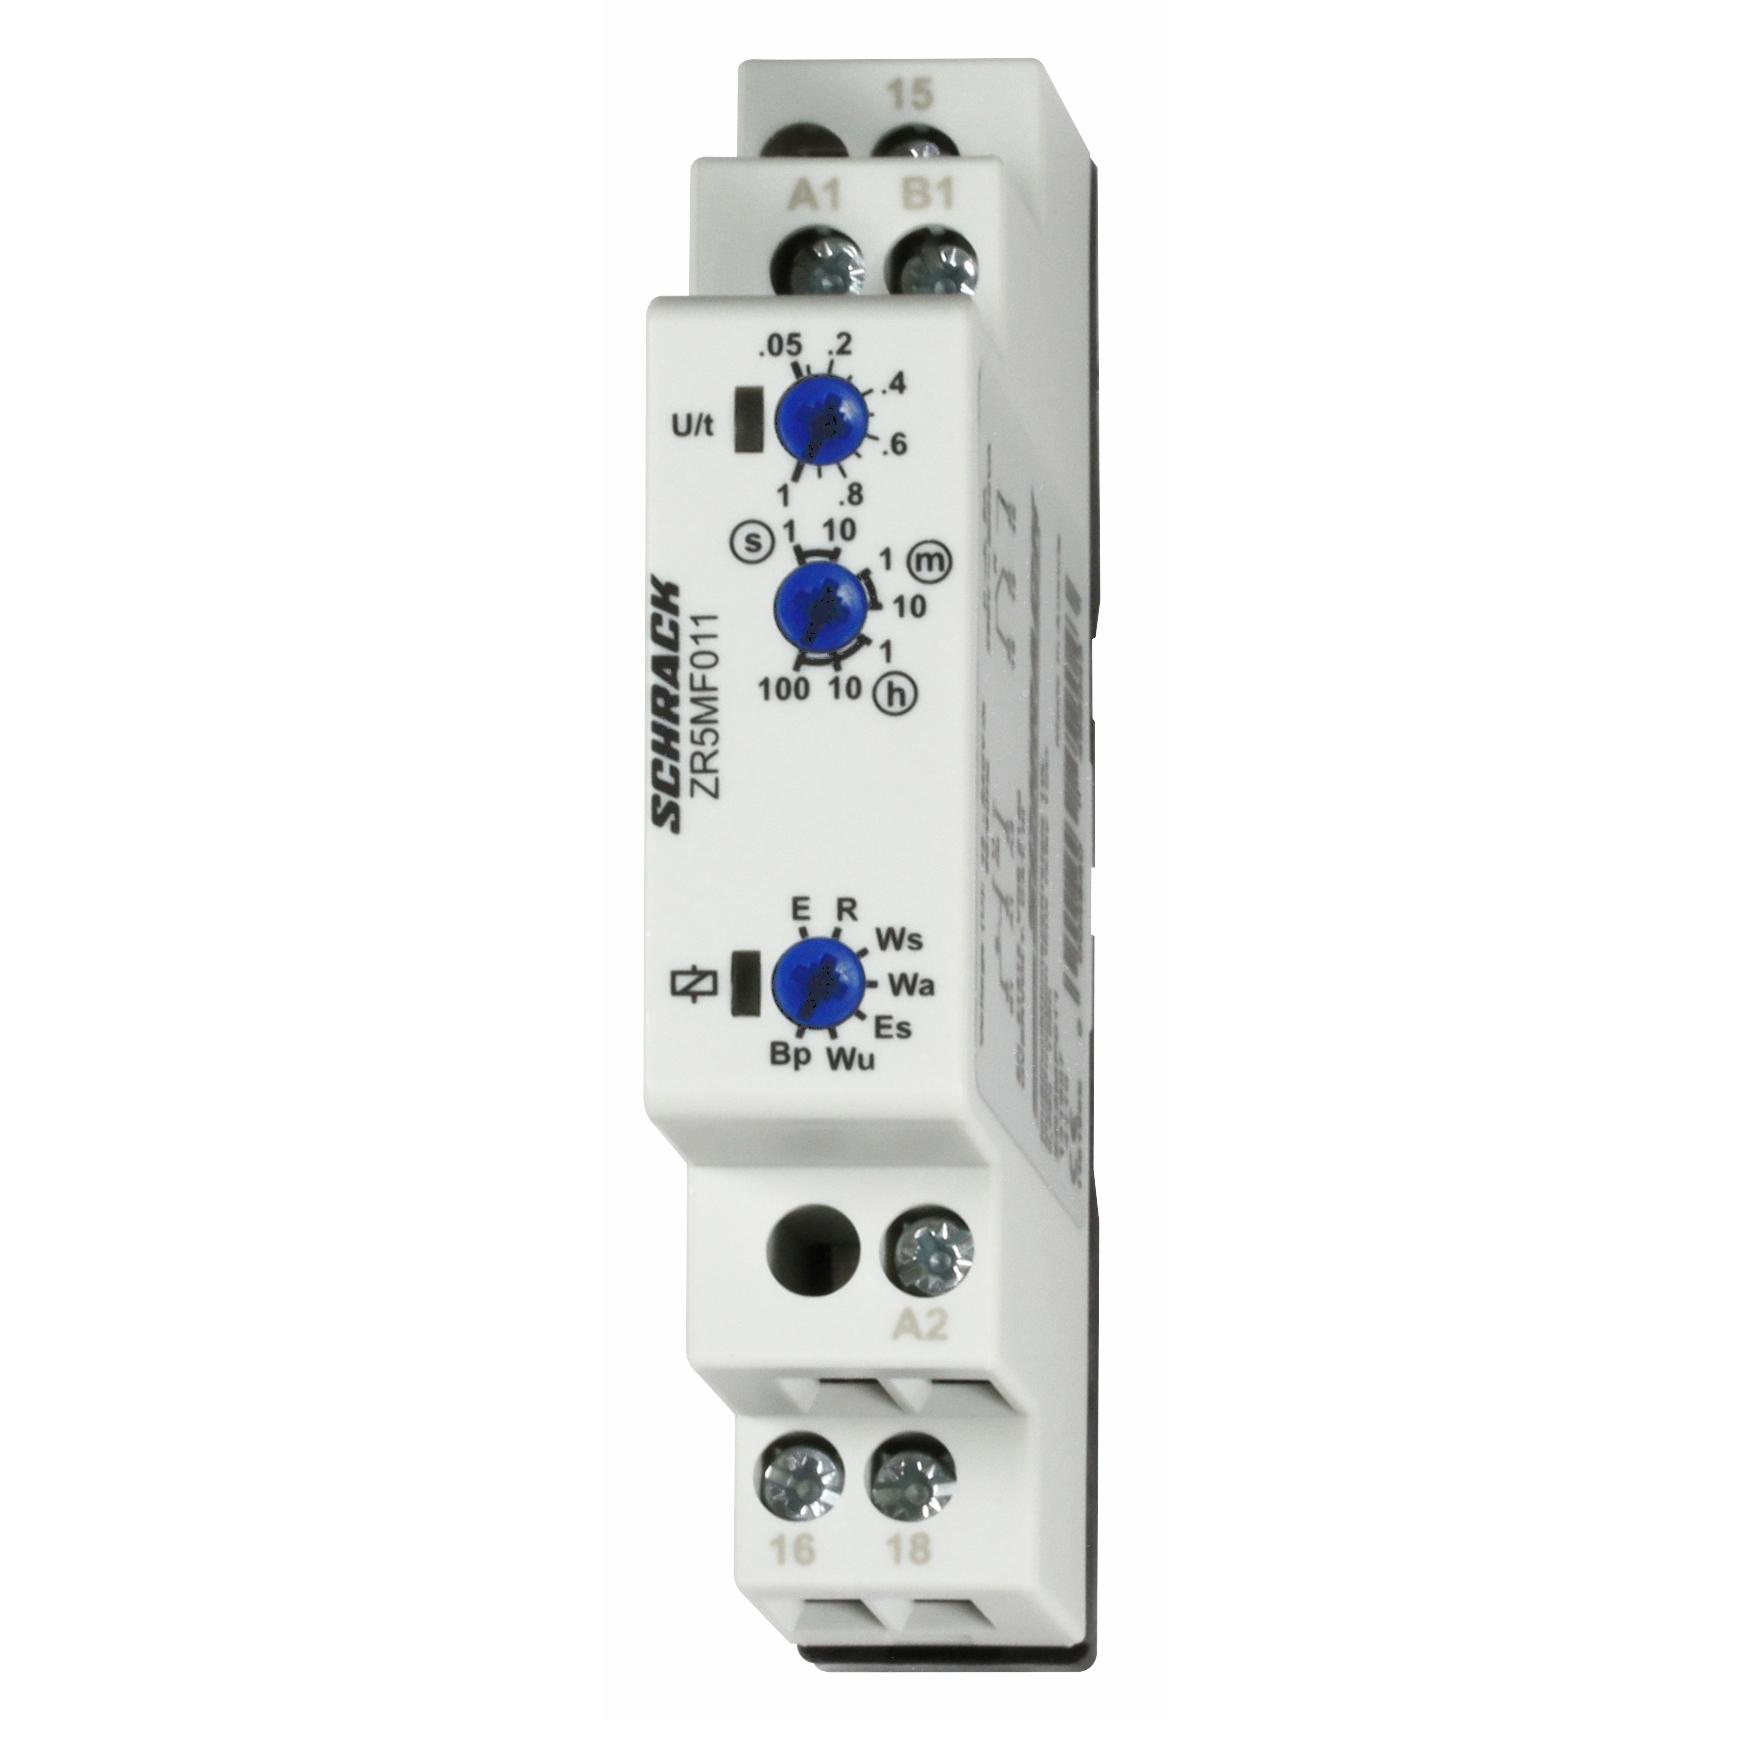 1 Stk Multifunktionsrelais, 12-240V AC/DC, 1 Wechsler, 8A/250V ZR5MF011--